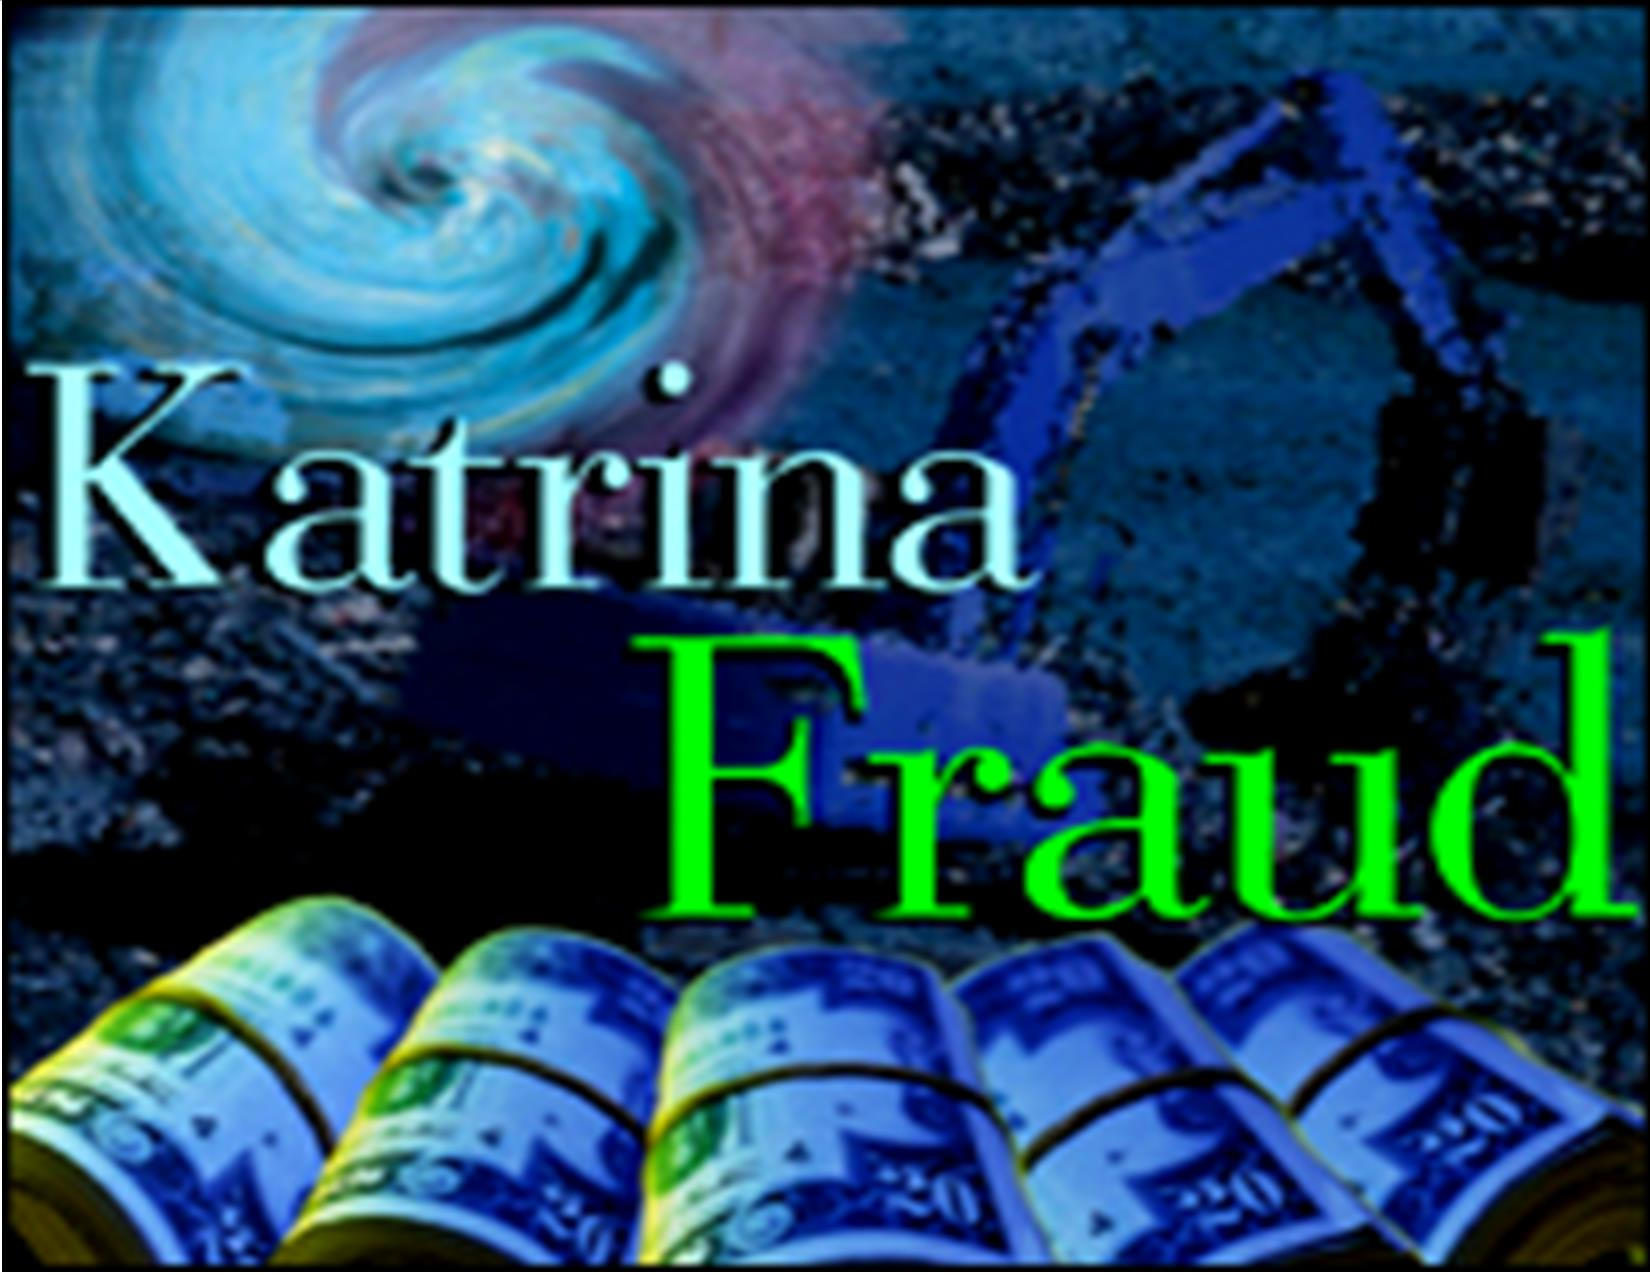 Katra Fraud Image FBI.gov